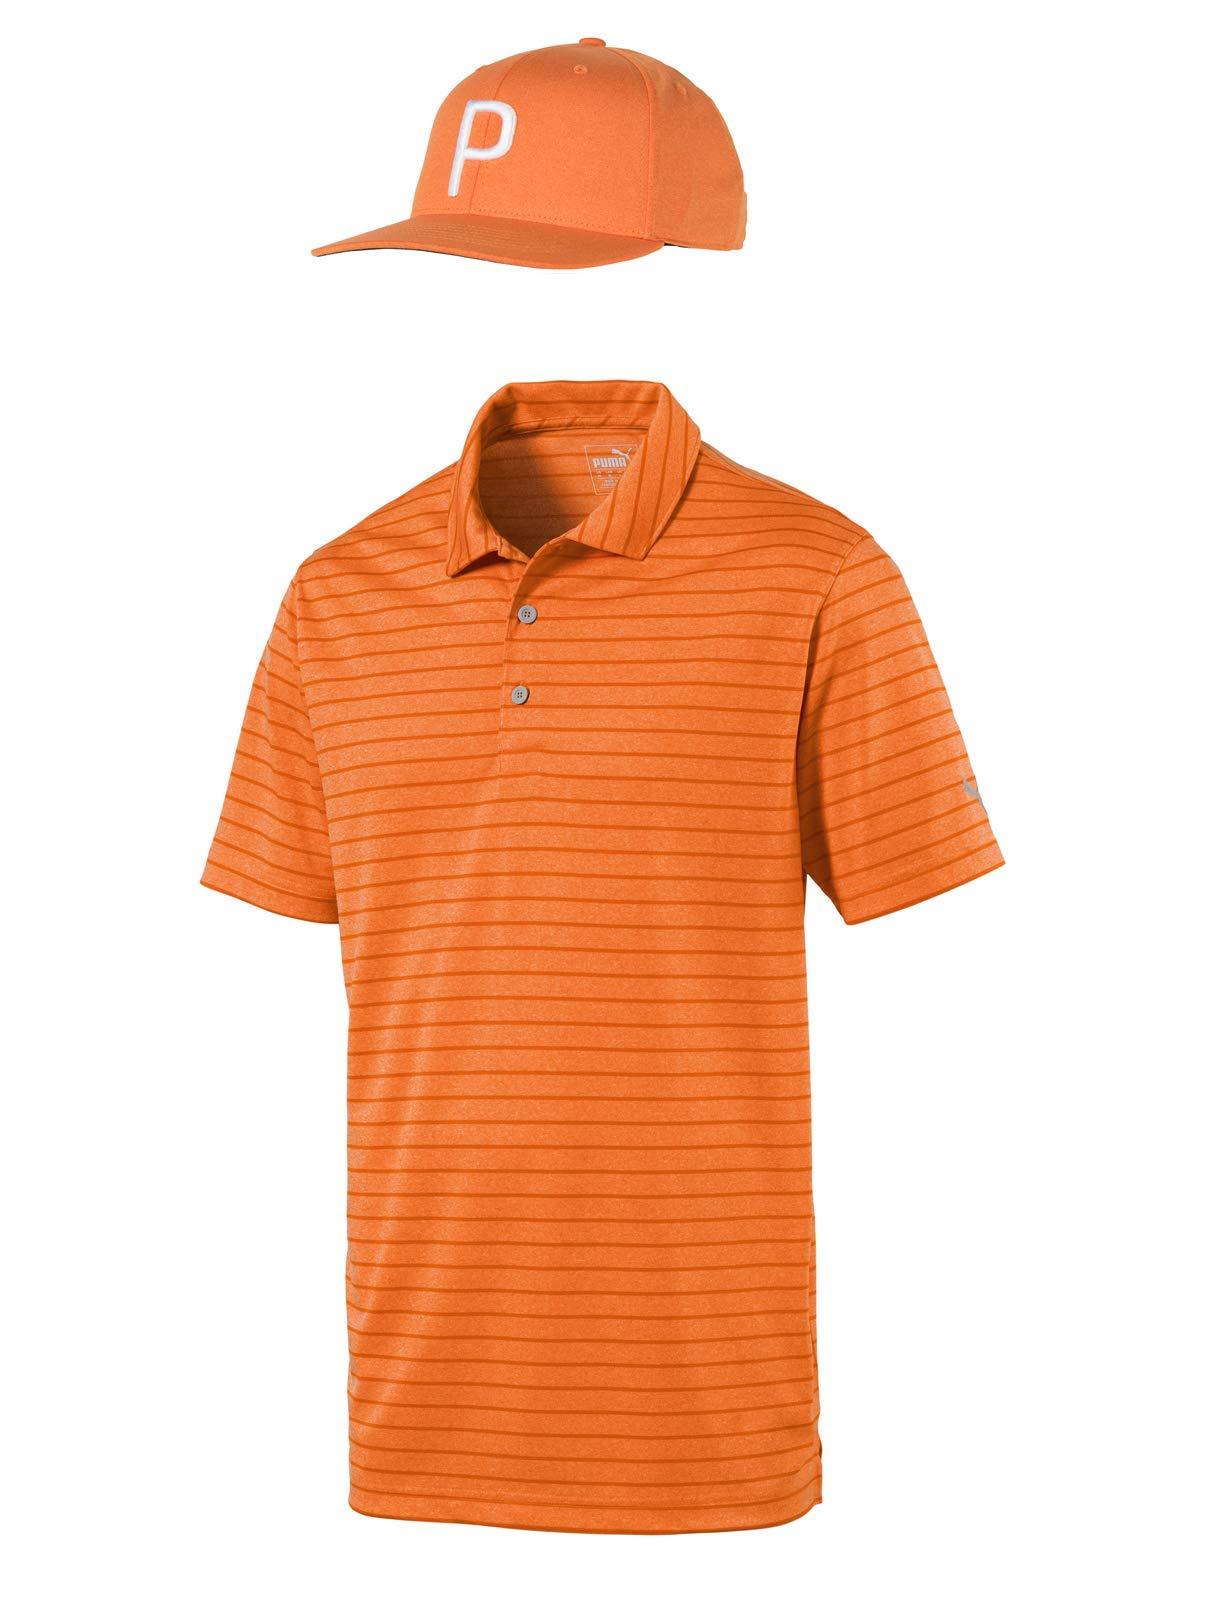 Rickie Fowler Masters Puma Golf Polo & Hat Bundle (2019)   Rotation Stripe Polo & P 110 Snapback (Vibrant Orange/Vibrant Orange, Medium)